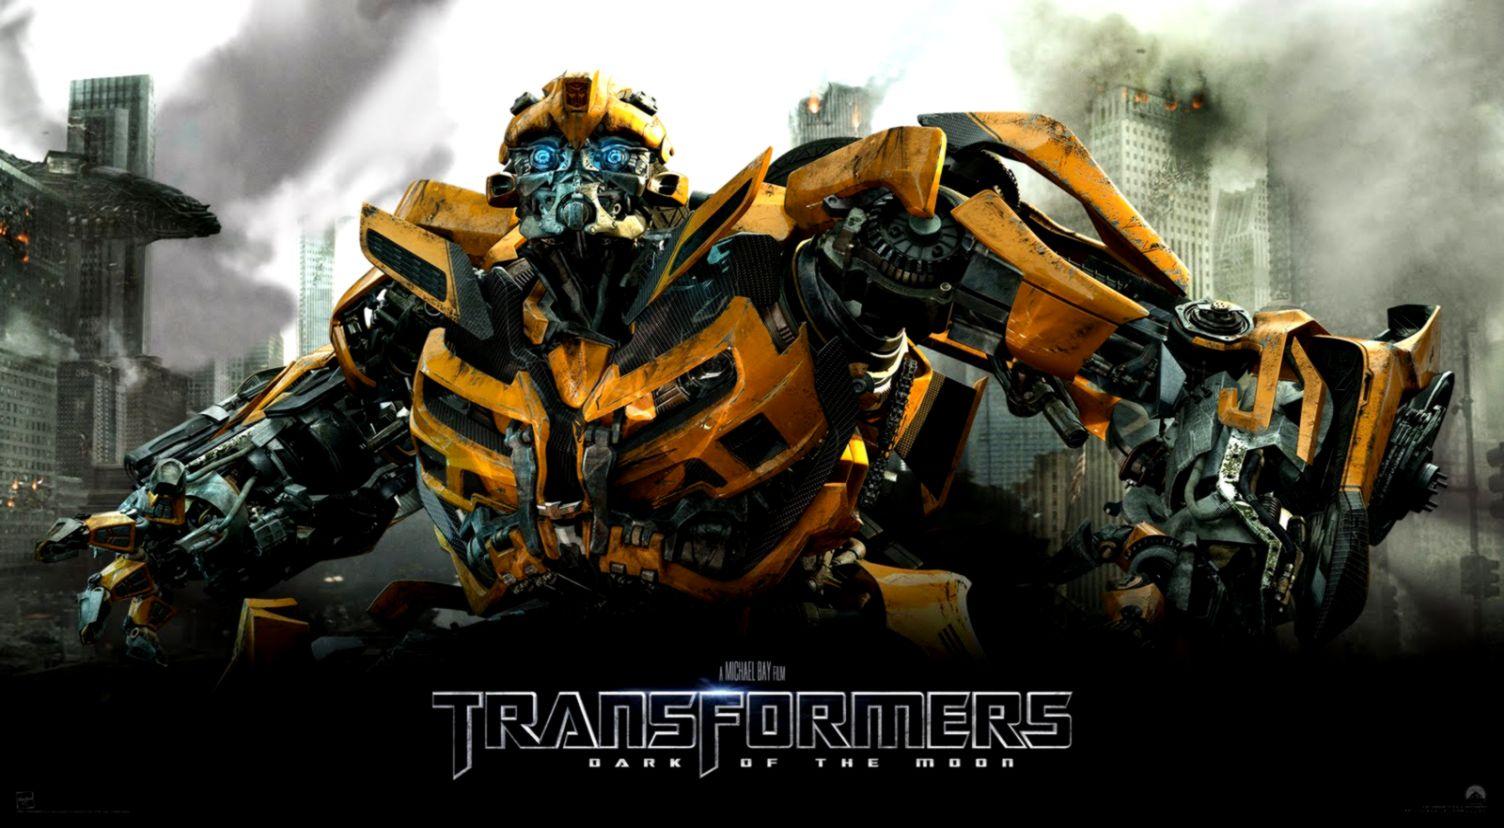 transformers 3 wallpaper best hd wallpapers